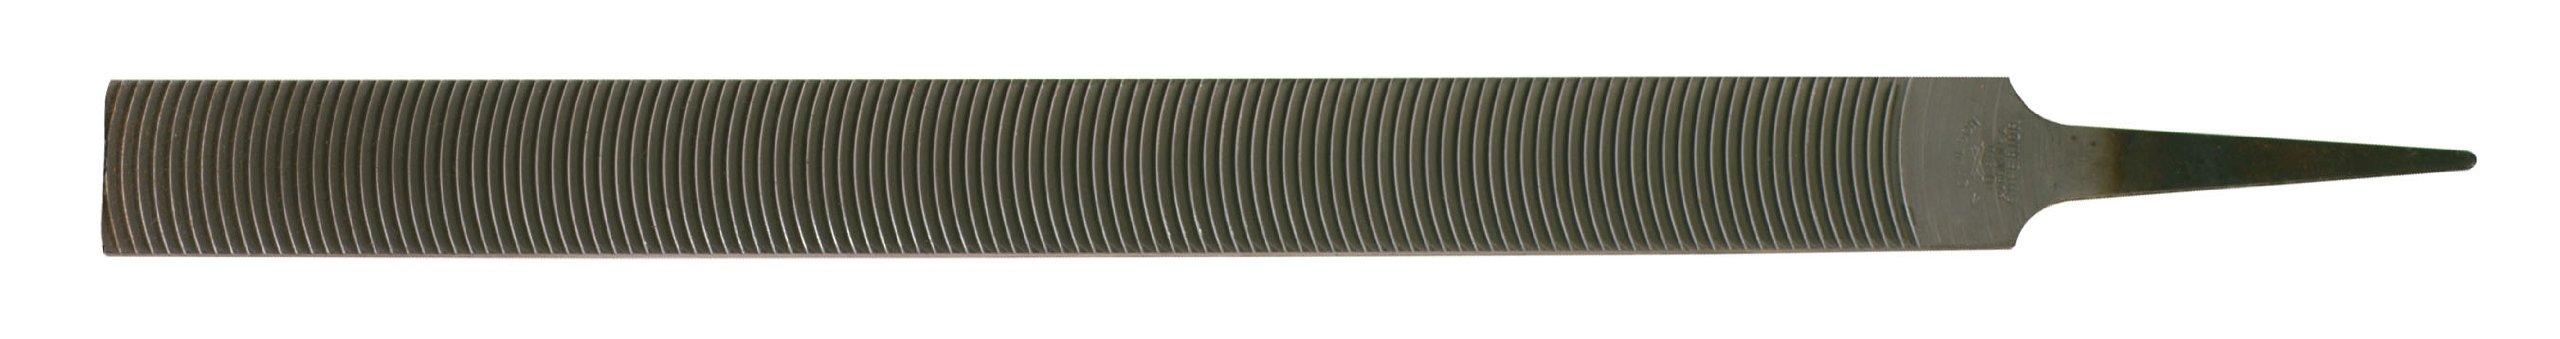 Nicholson Flat Utility Hand File, Standard/Smooth Pattern, Curved Cut, Rectangular, 12'' Length